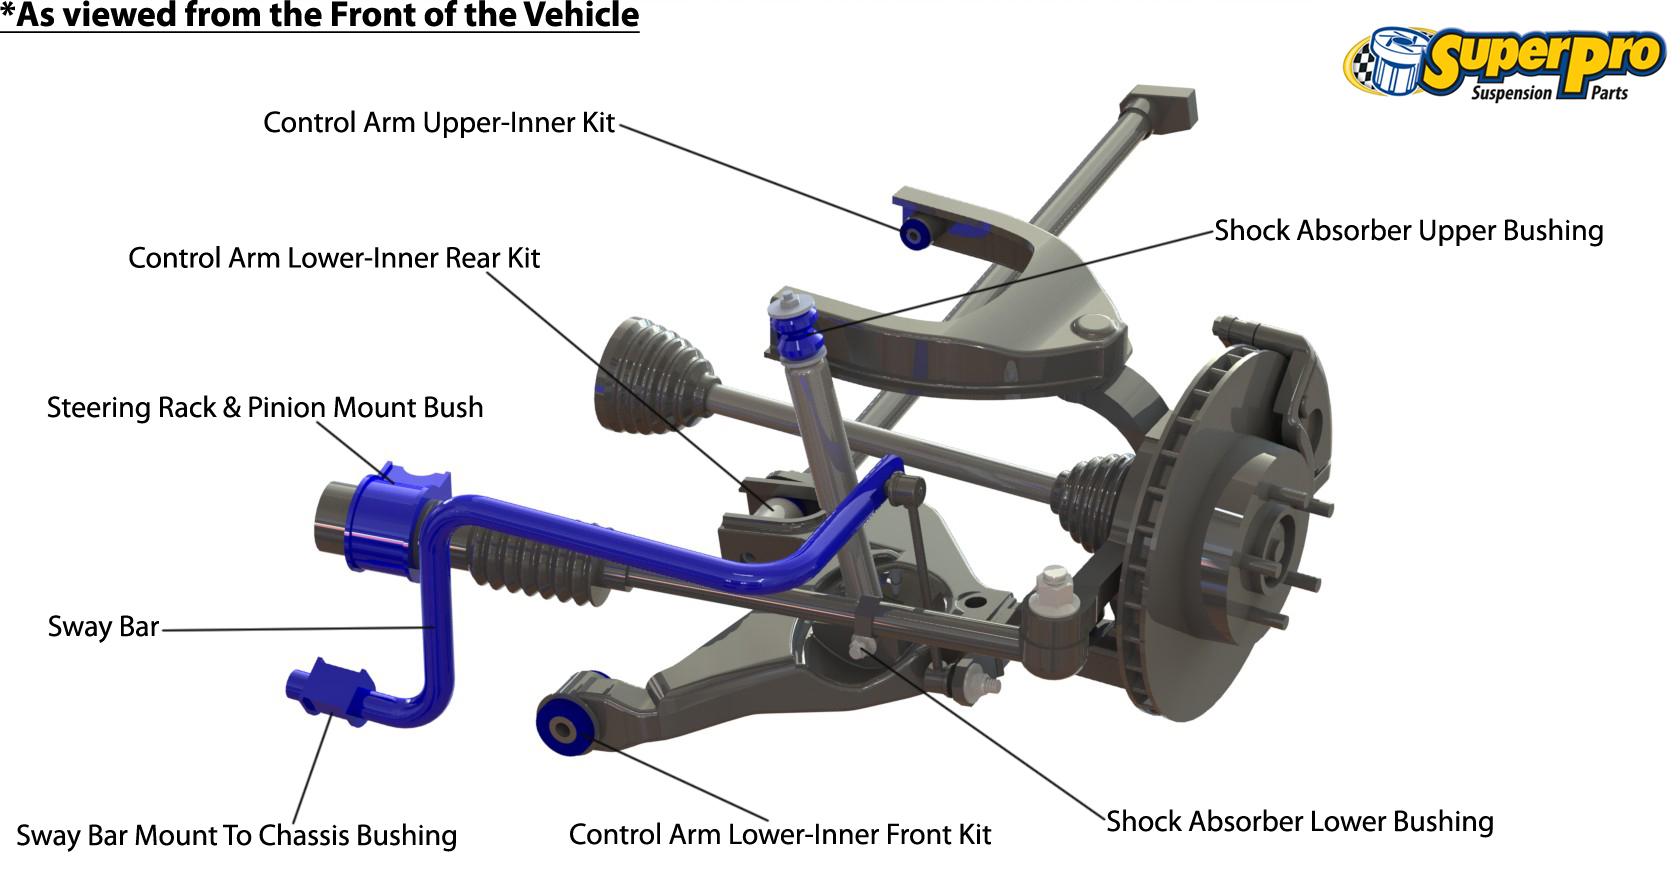 Superpro Suspension Parts And Poly Bushings For Mitsubishi Pajero 97 Montero Sport Engine Diagram Front 1991 2000 Nh Nj Nk